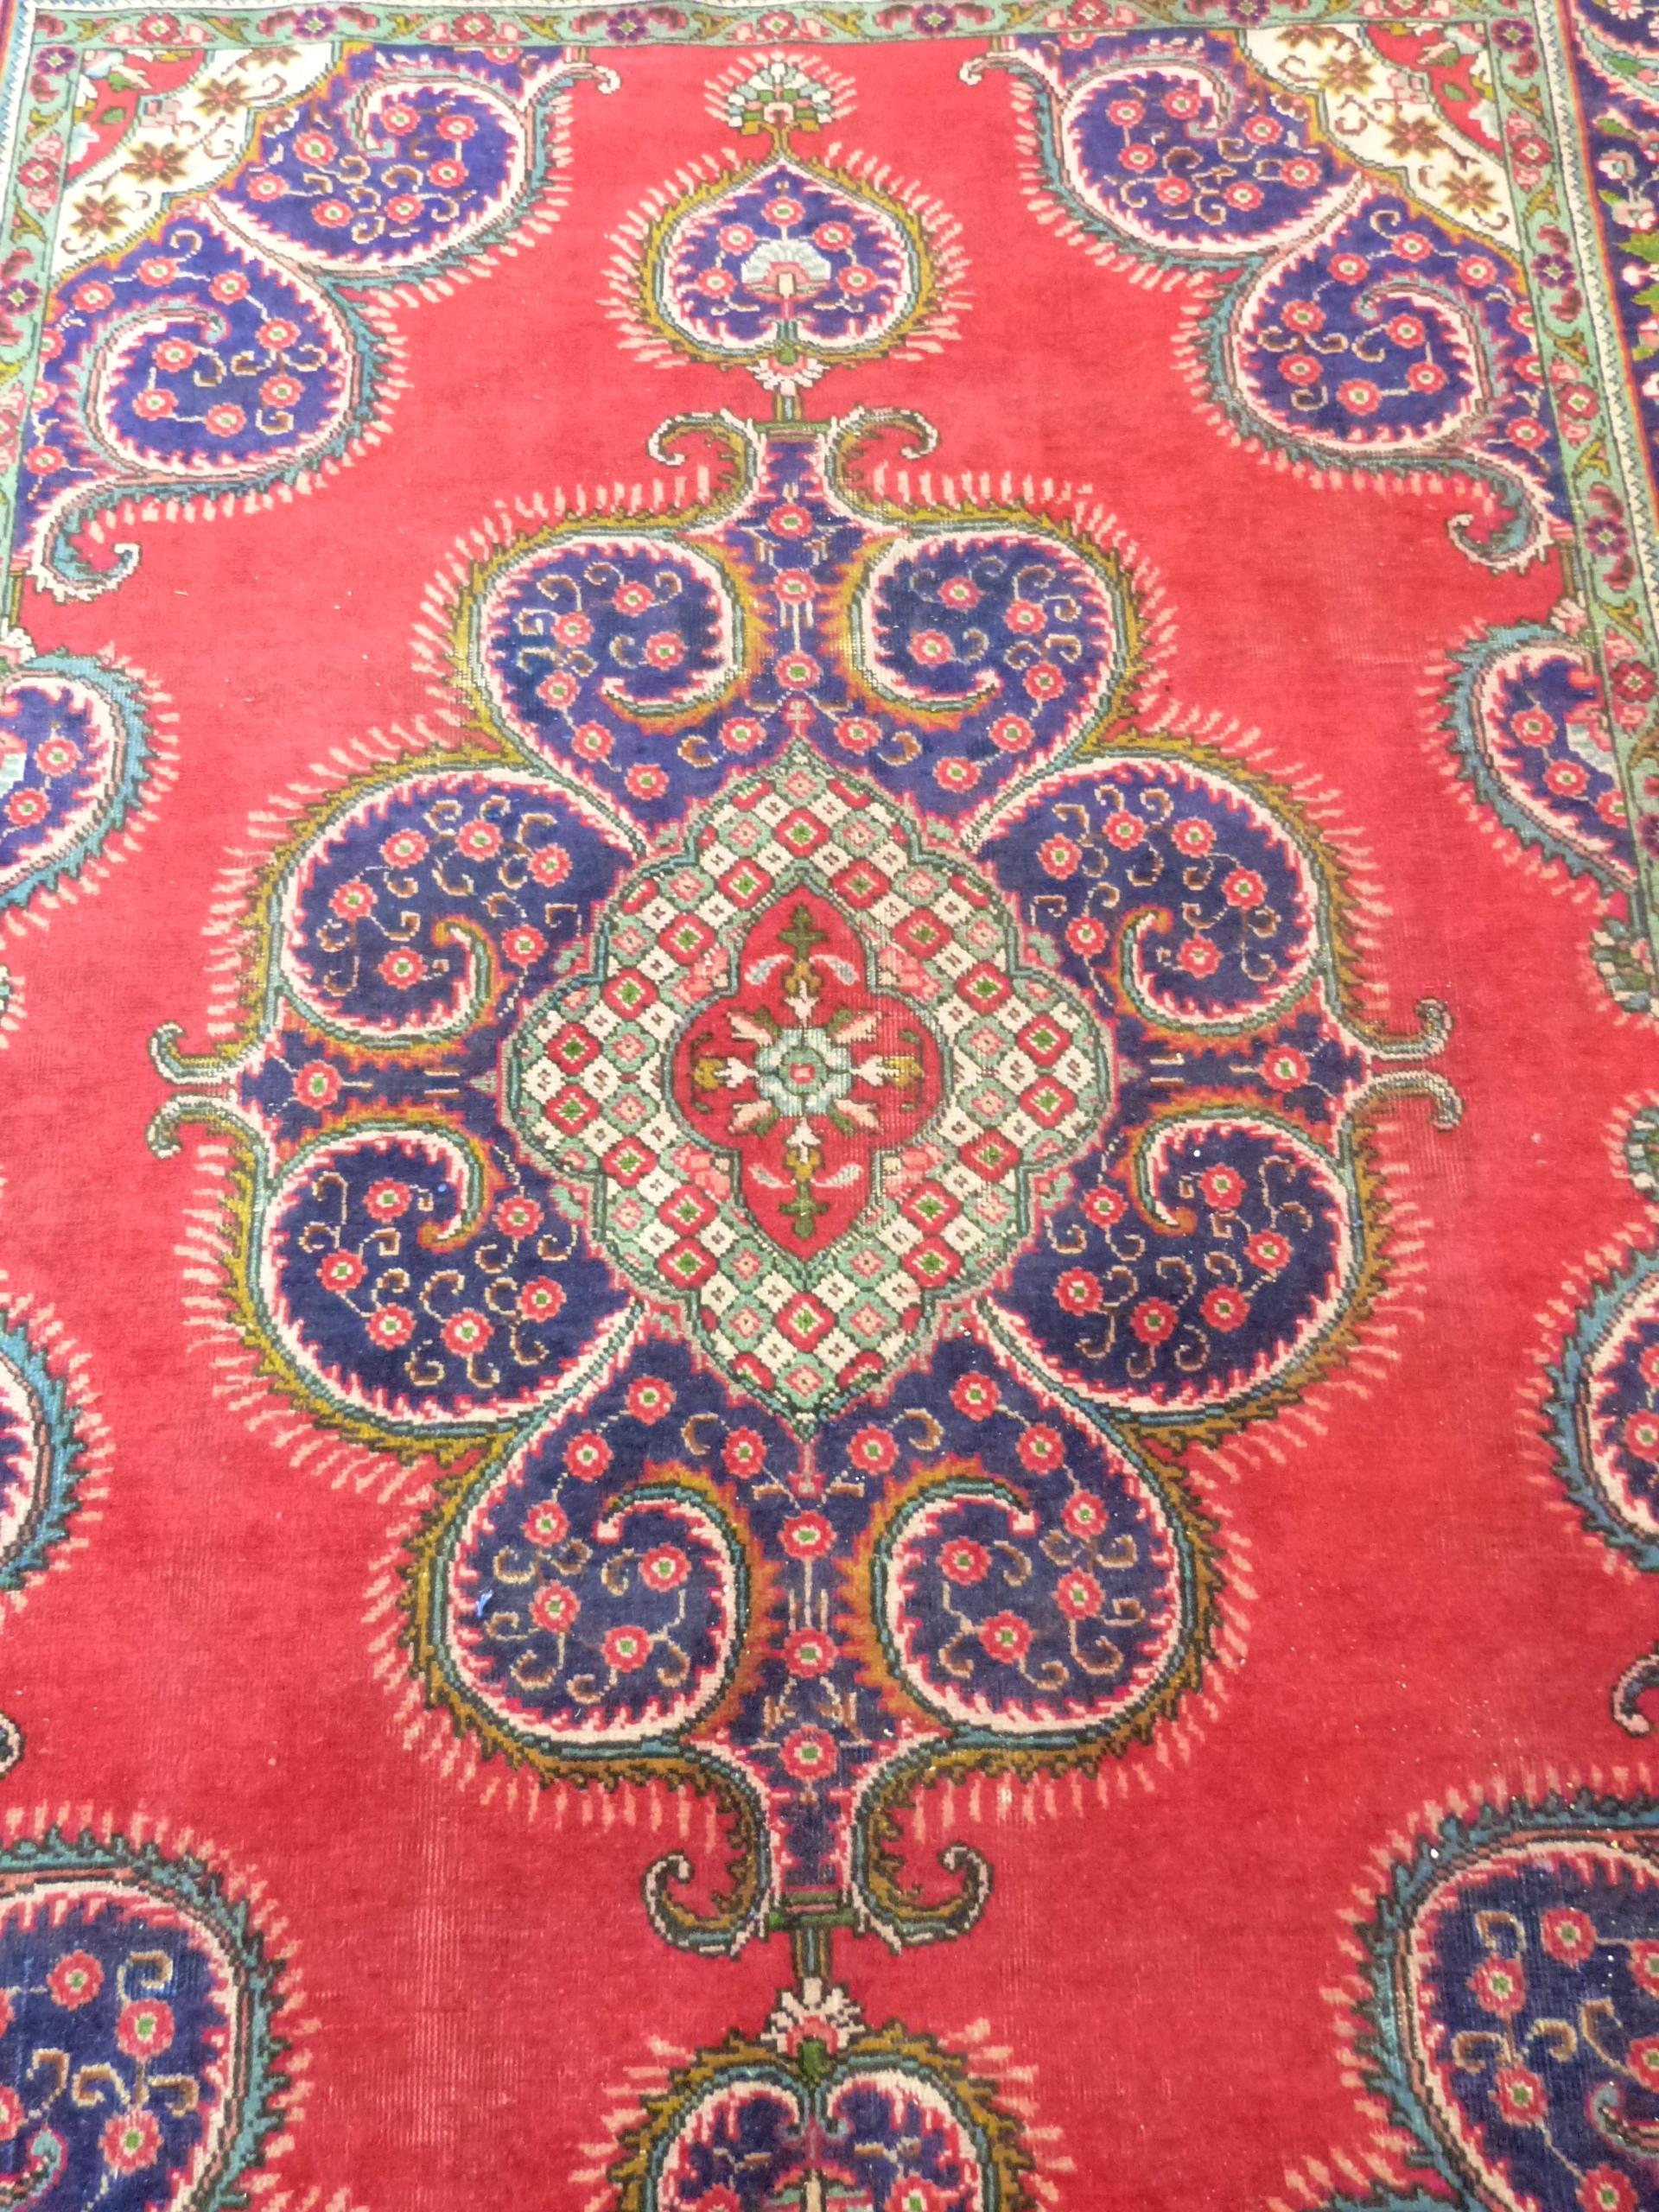 Deep ground thick pile Persian Narouan Carpet,decorated with various motifs & symbols 276cm x - Image 4 of 9